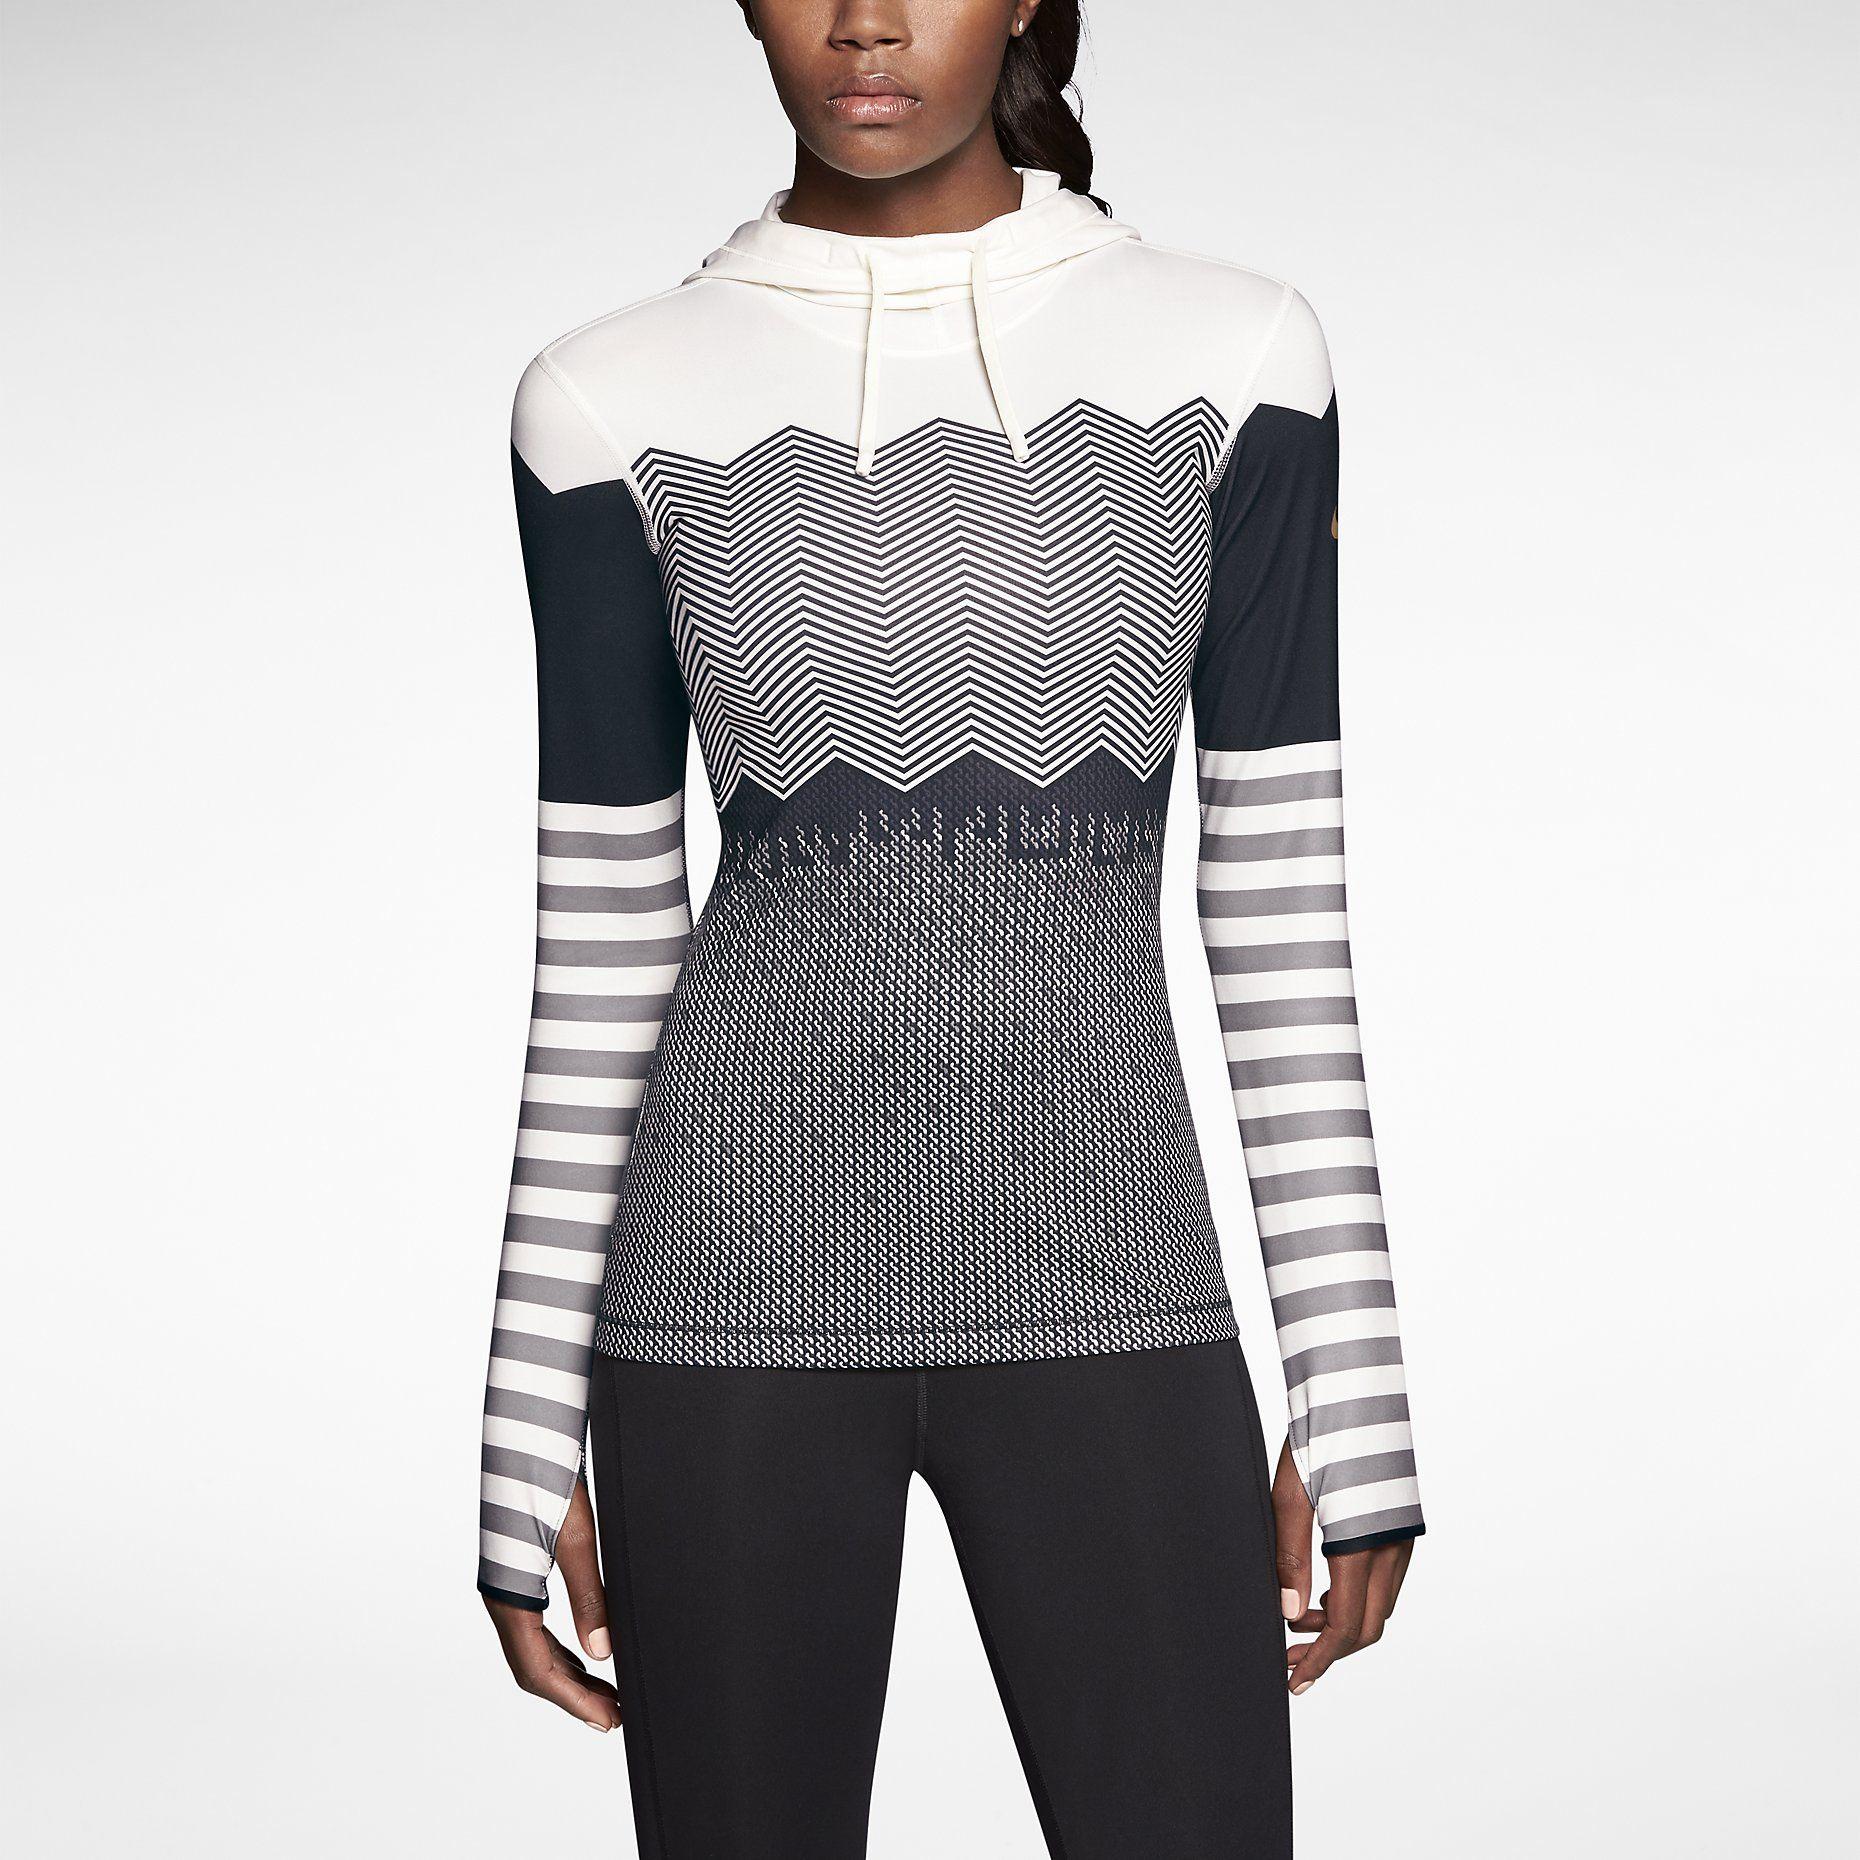 Nike Pro Hyperwarm Engineered Print Women s Training Hoodie. Nike ... c98da46f1c23a